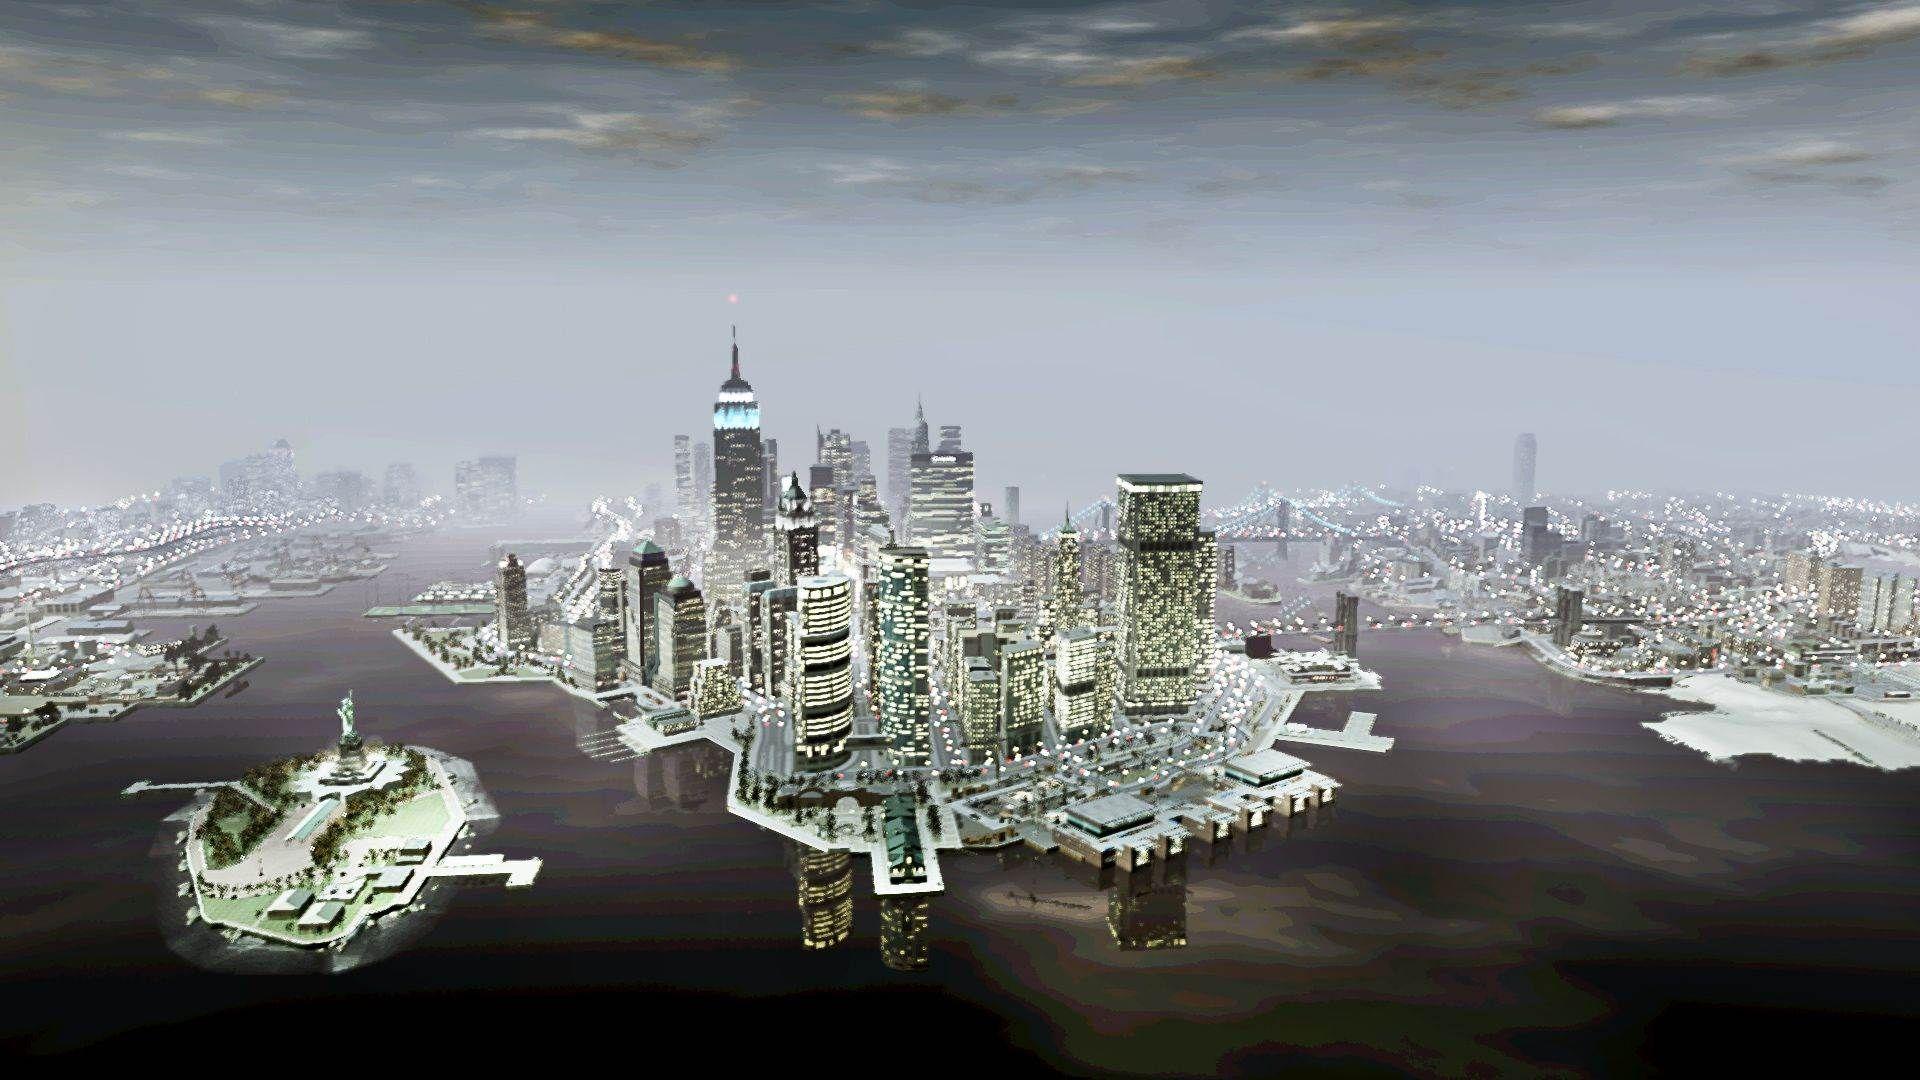 Grand Theft Auto IV HD desktop wallpaper : Widescreen : High 1280×1024 Gta Iv   Adorable Wallpapers